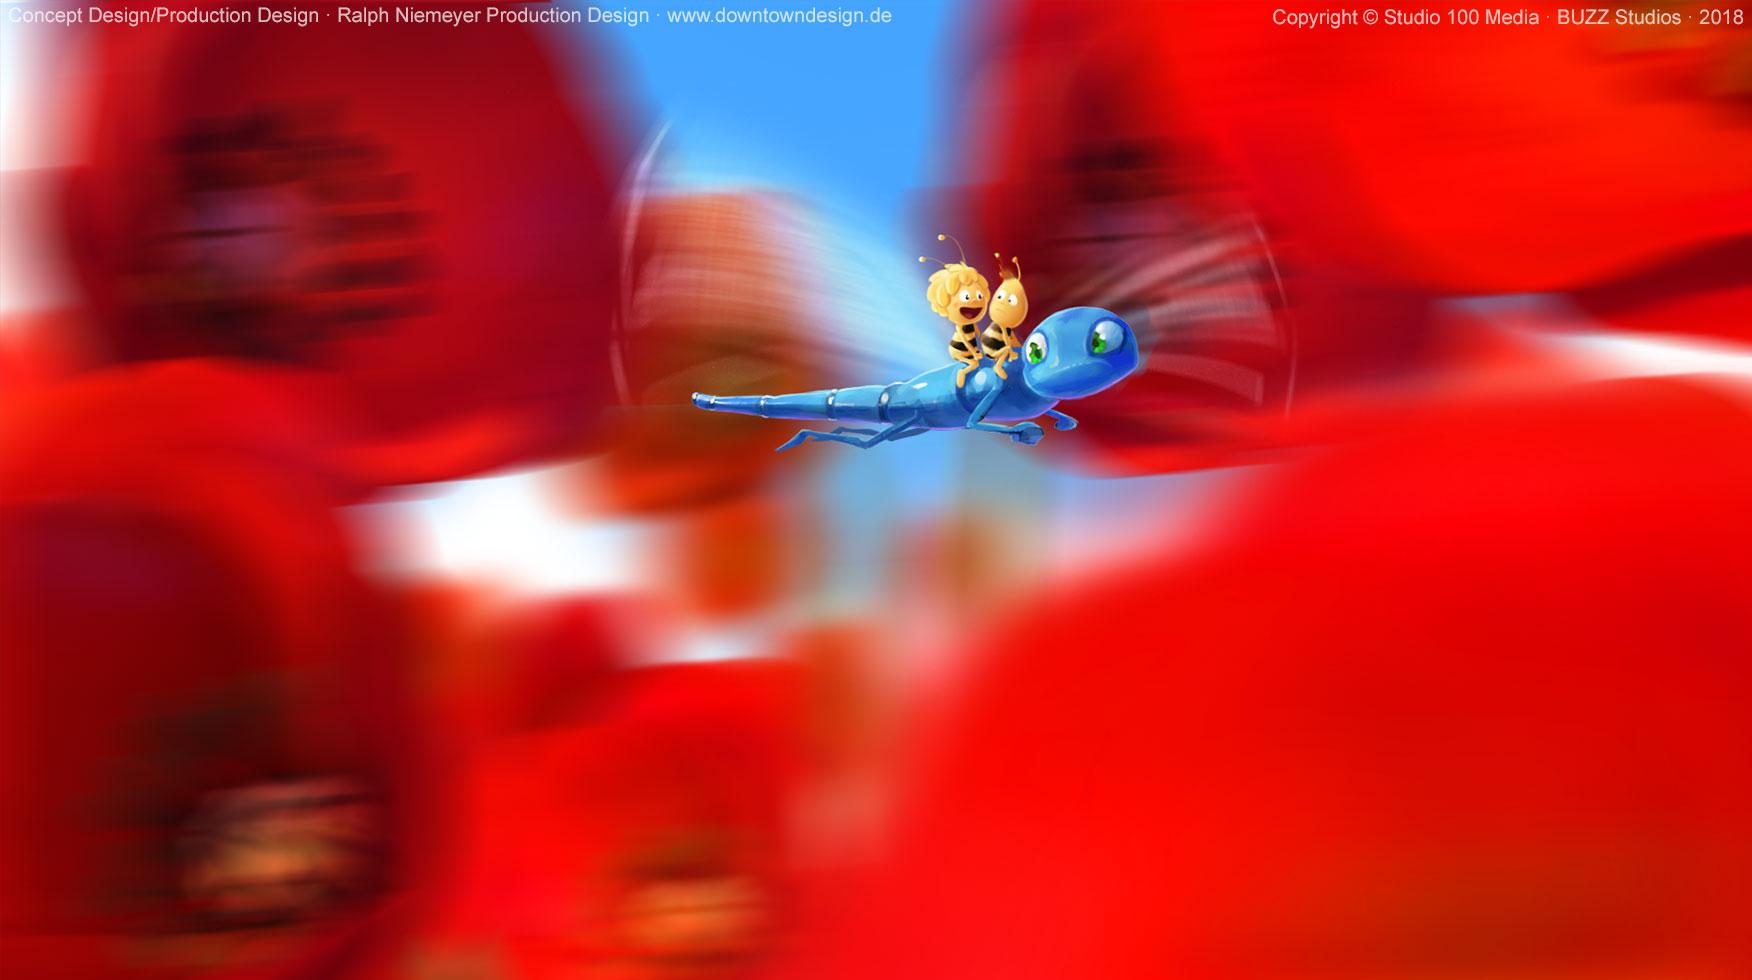 die-biene-maja-2-die-honigspiele-concept-art-ralph-niemeyer-poppy-flowers